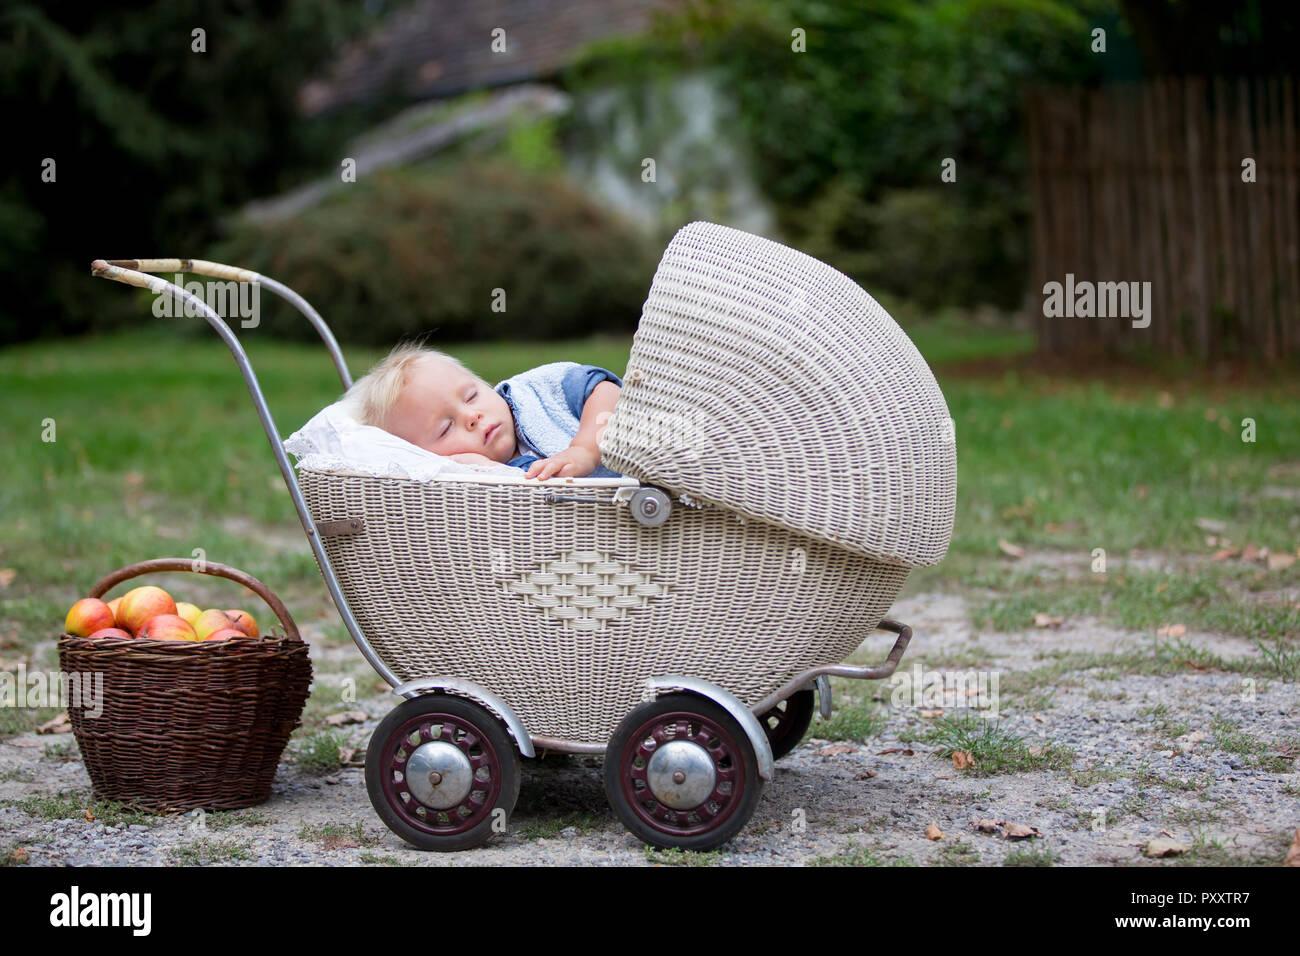 Vintage baby crib stockfotos & vintage baby crib bilder seite 3